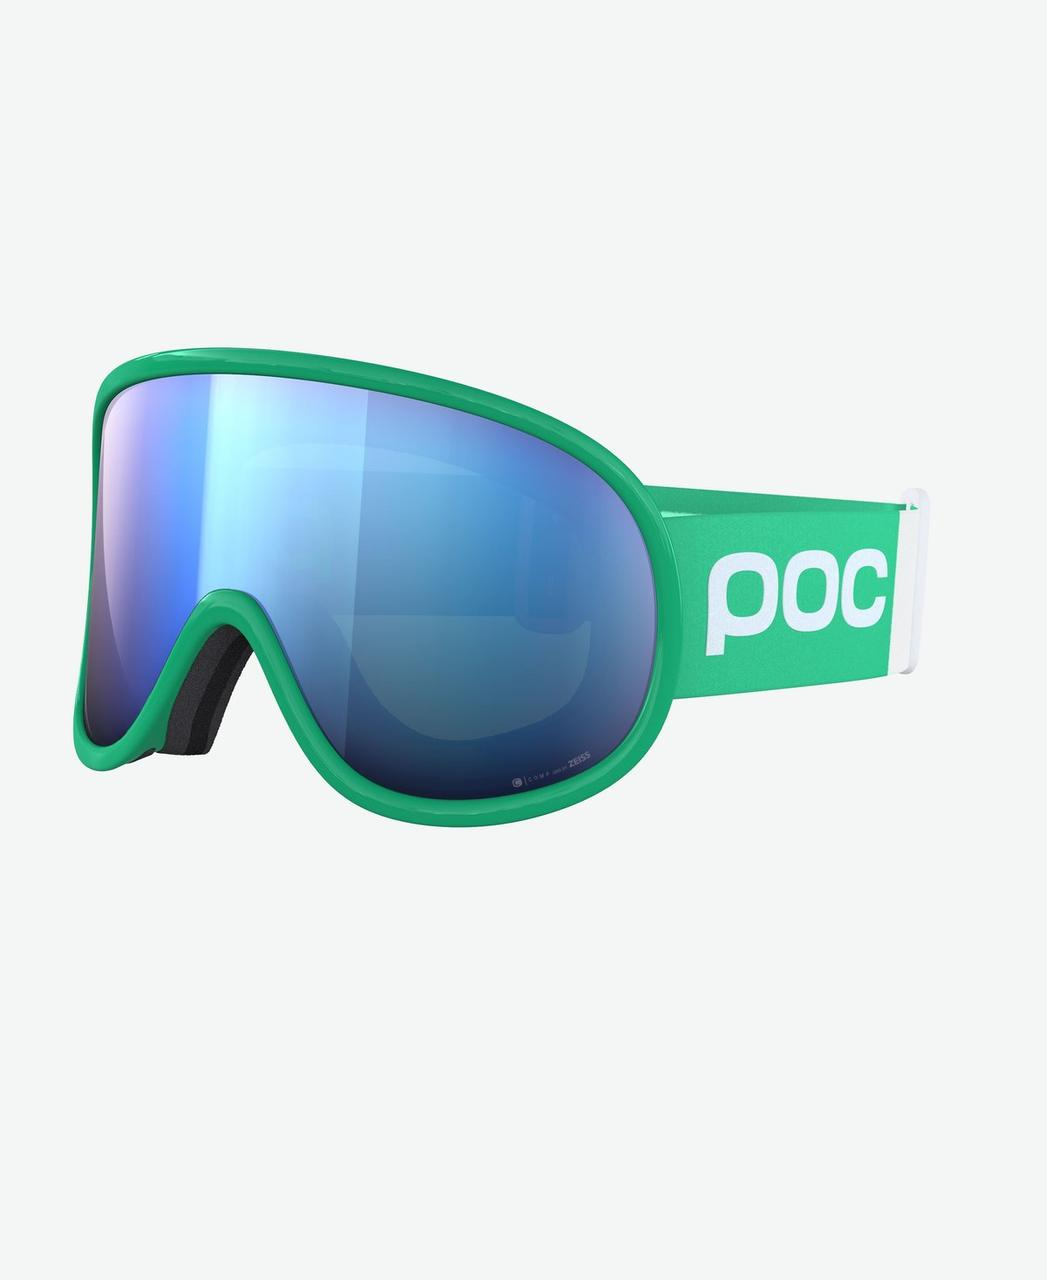 Retina Big Clarity Comp маска гірськолижна (Emerald Green/Spektris Blue)